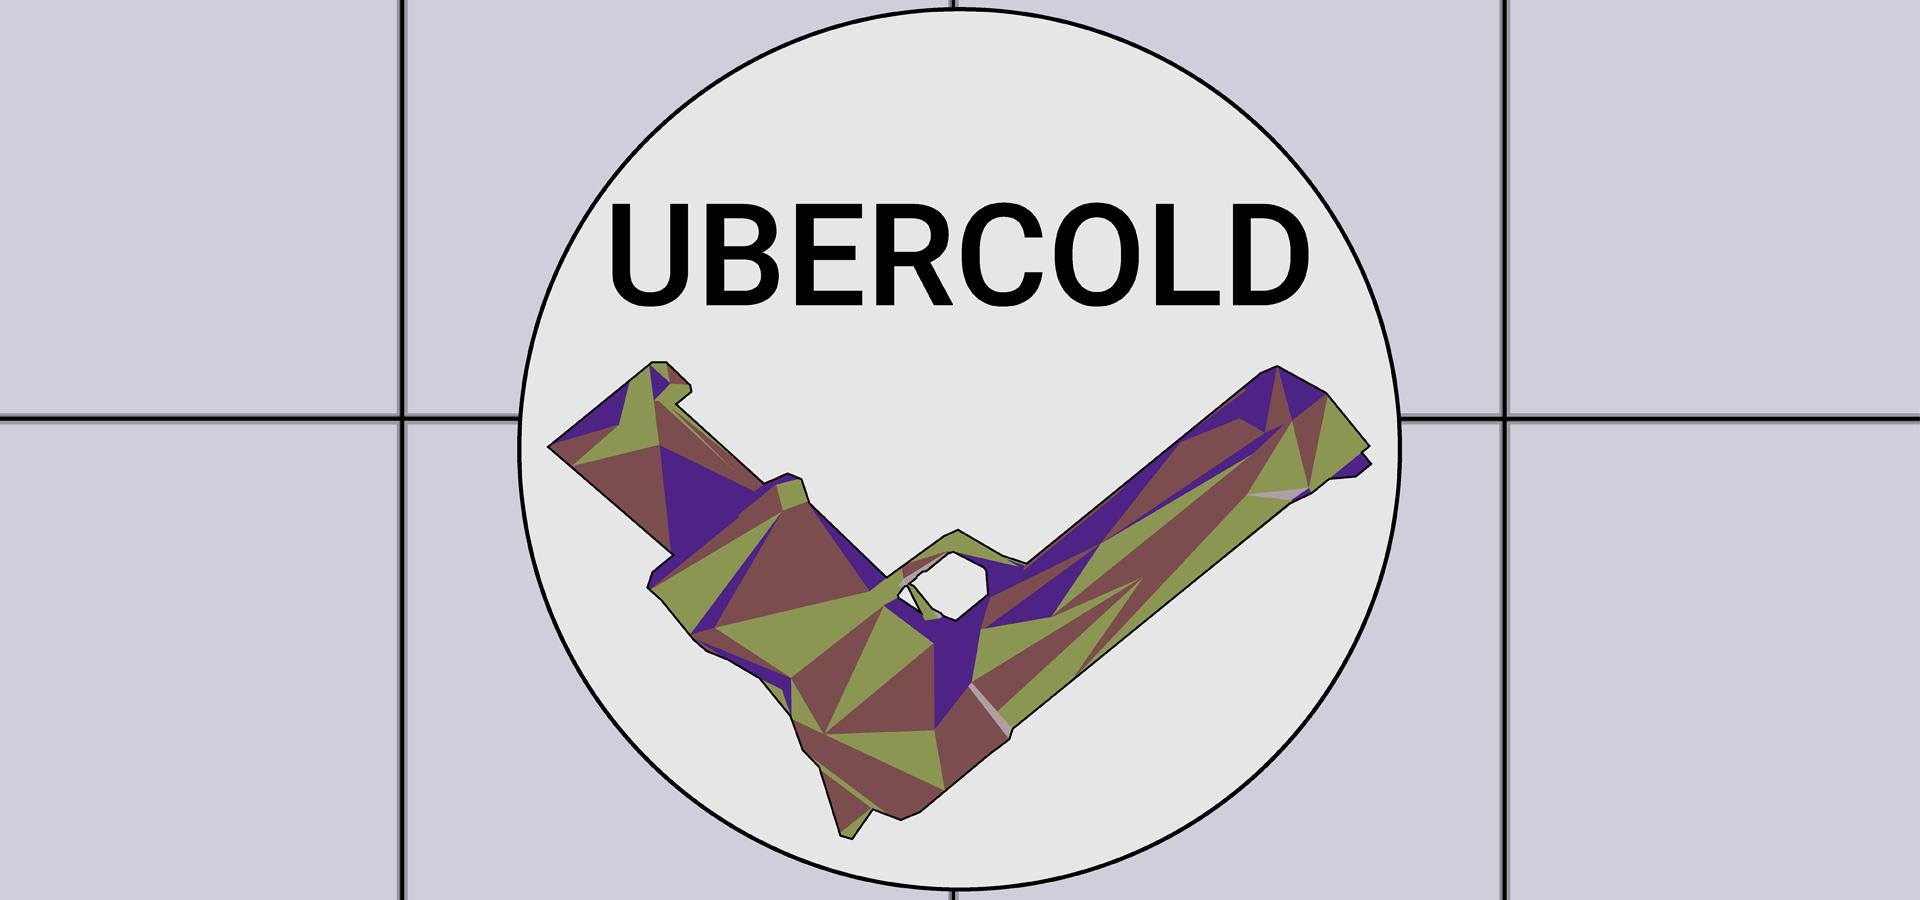 UBERCOLD